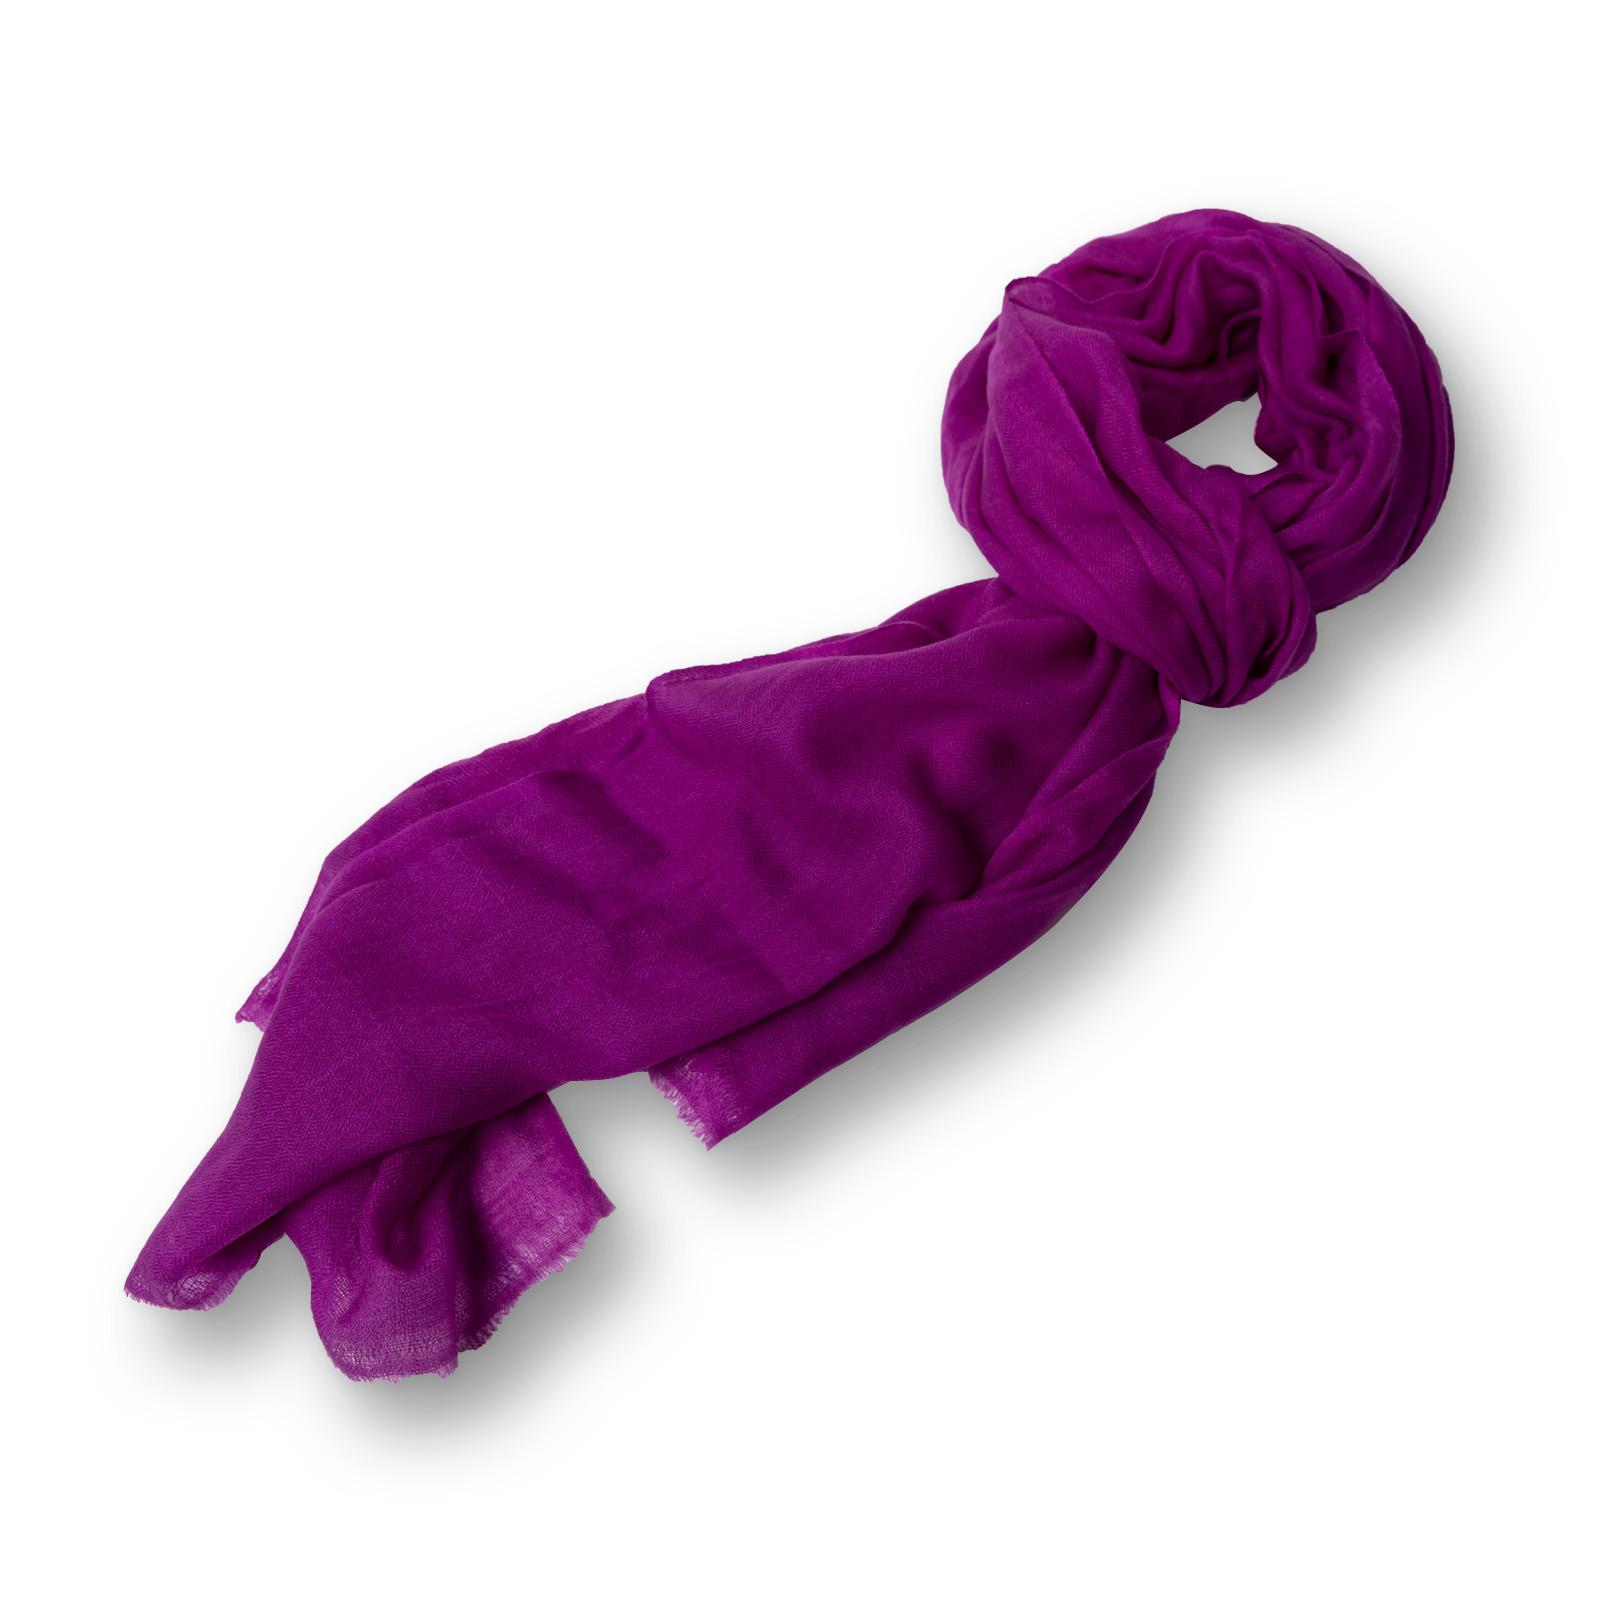 Pashmina - 100%  Cashmere  einfarbig aus Nepal  70x200 cm lila